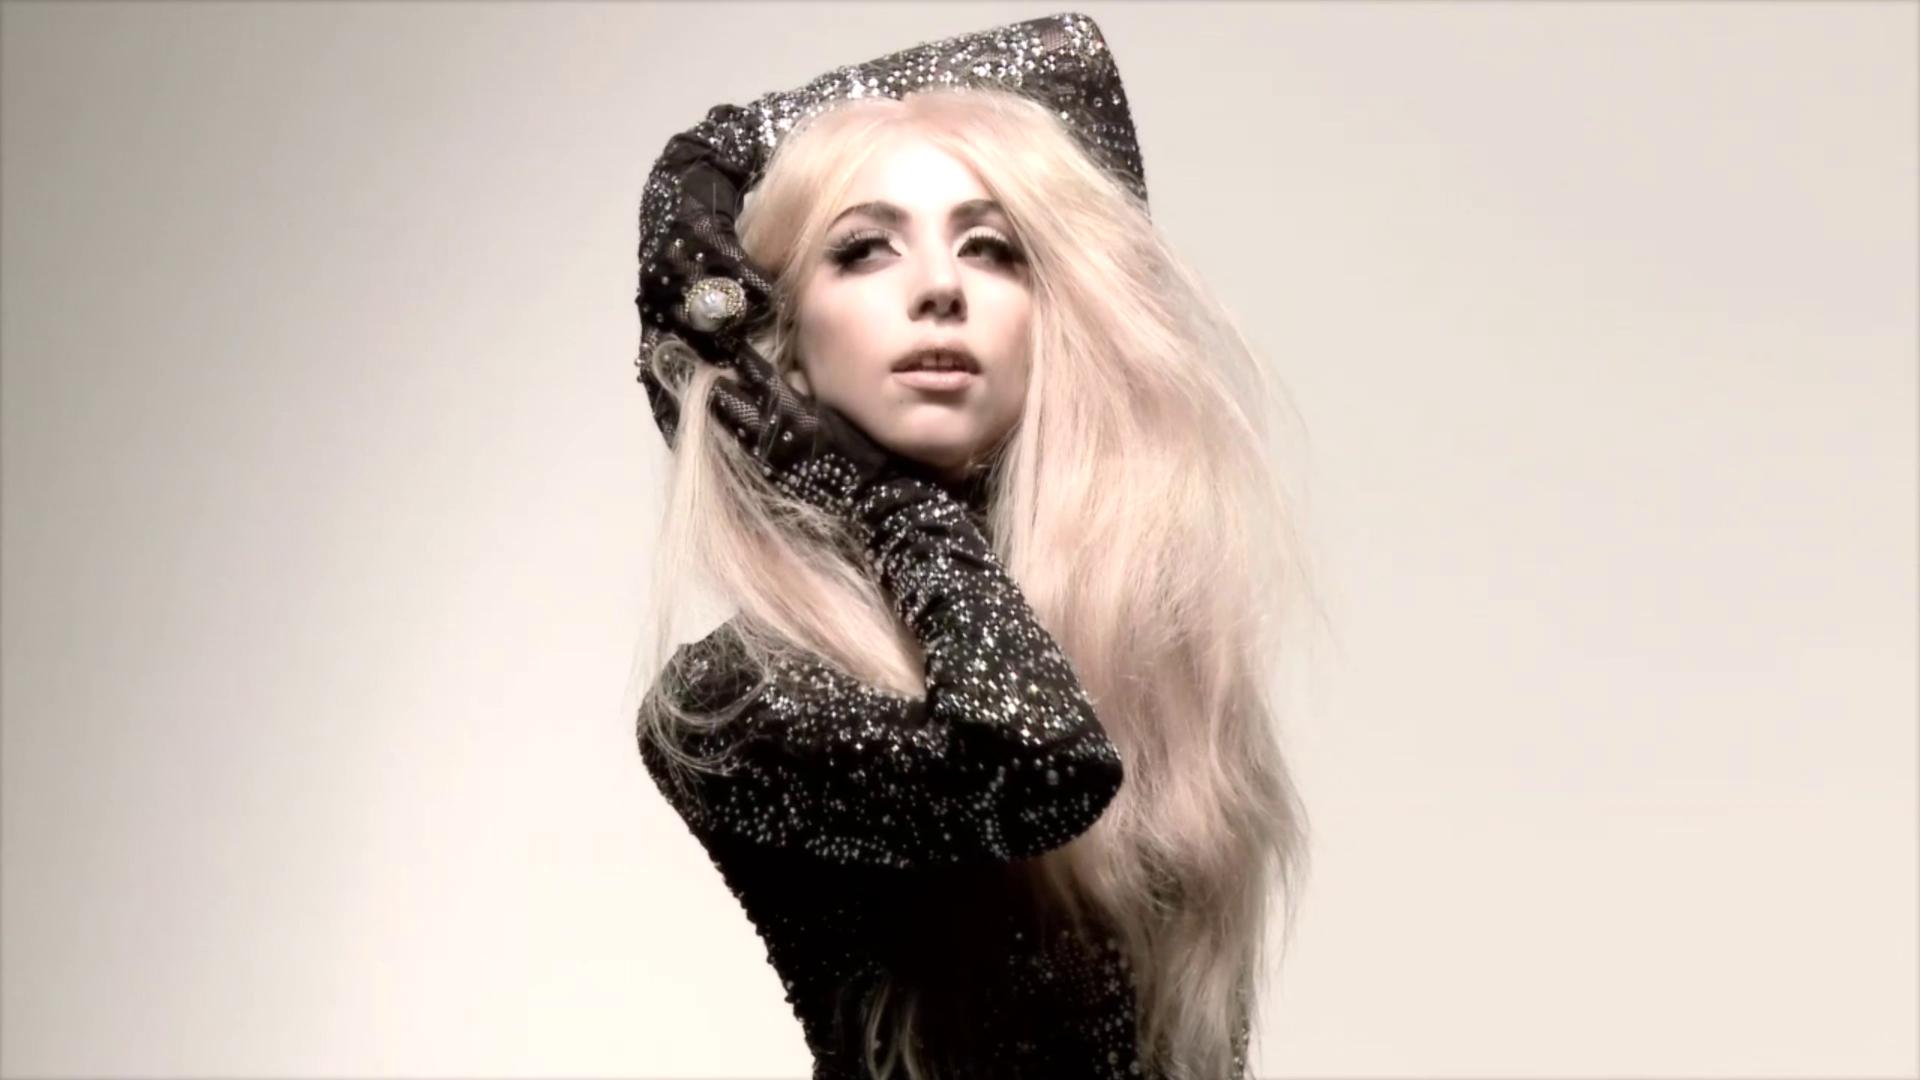 File:Gaga-vanity-fair.jpg